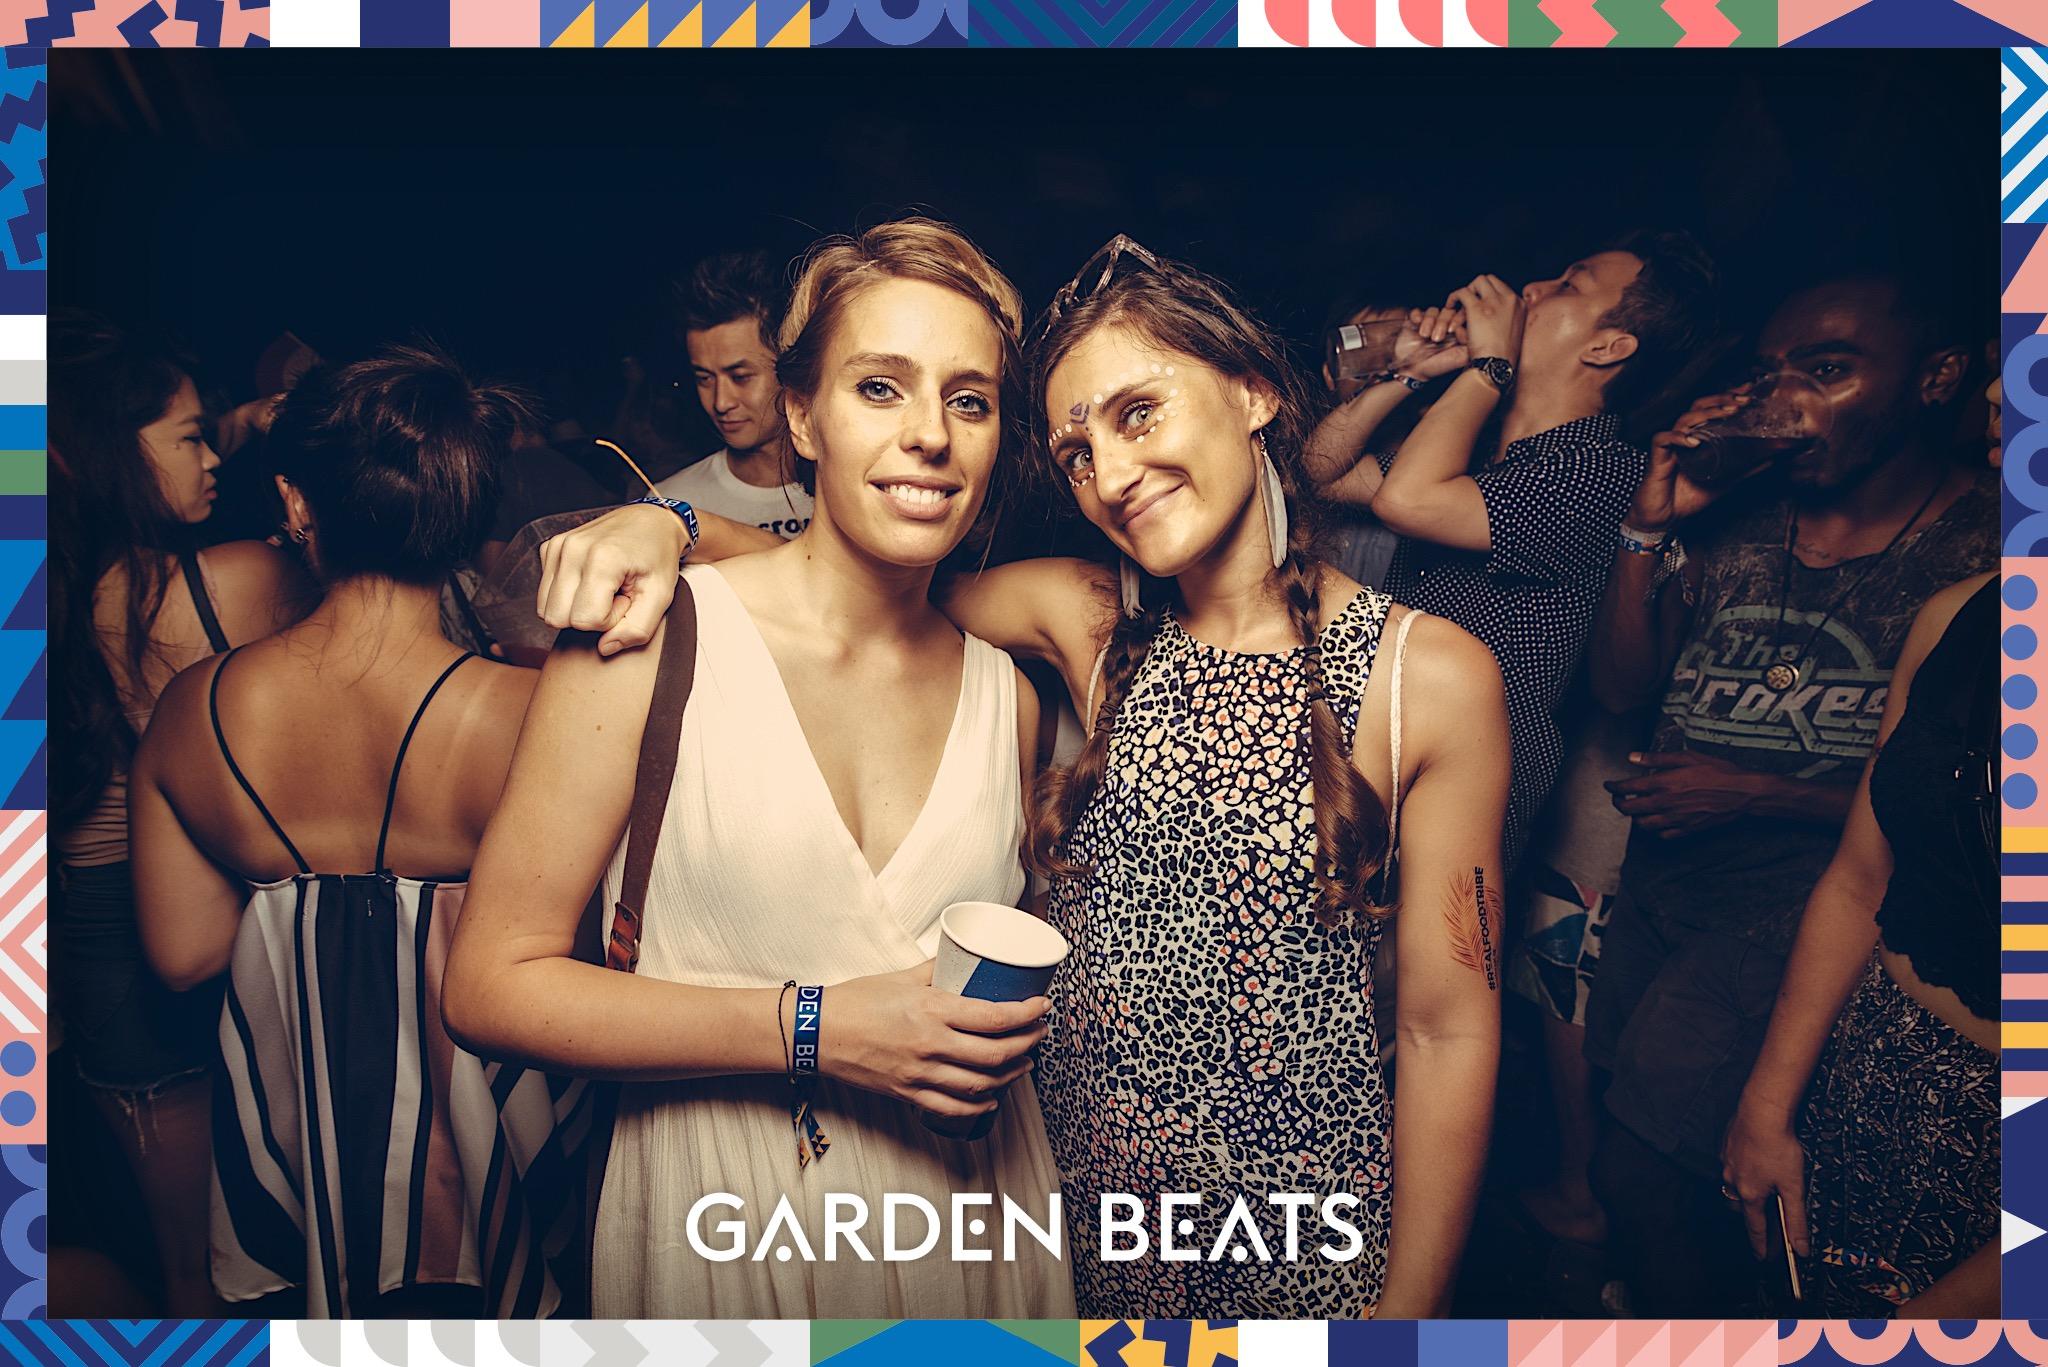 18032017_GardenBeats_Colossal734_WatermarkedGB.jpg